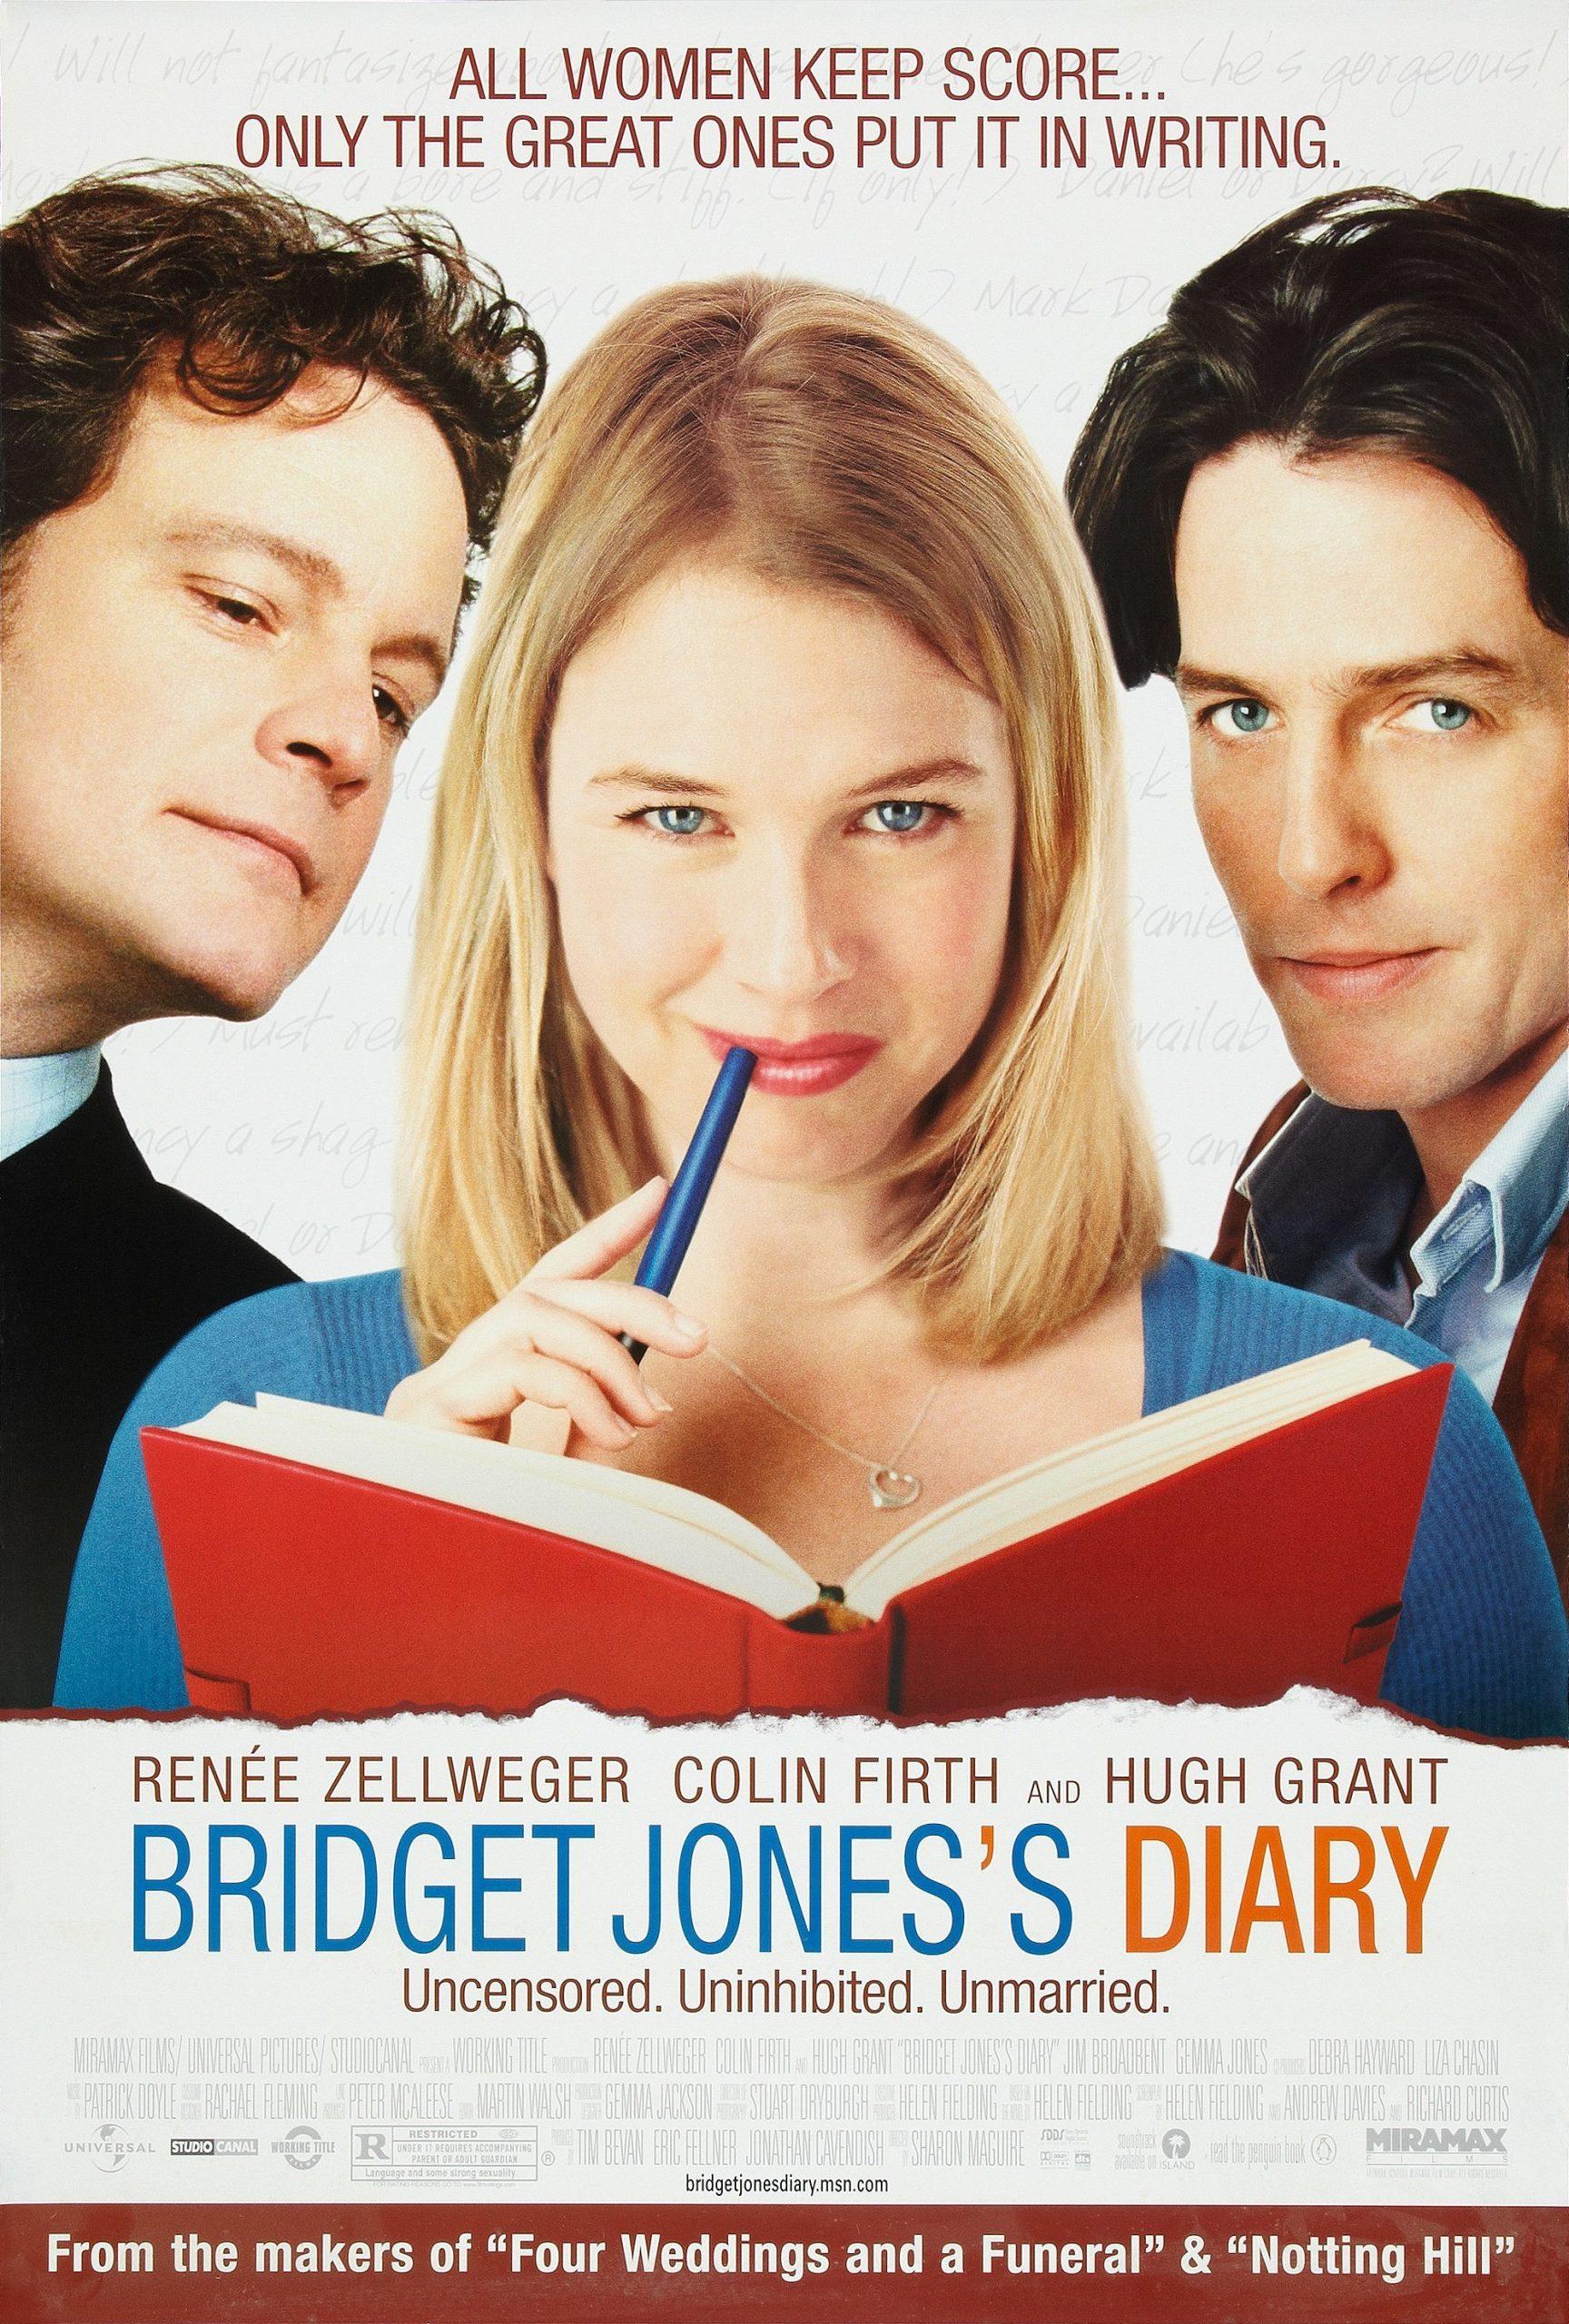 The poster for Bridget Jones's Diary